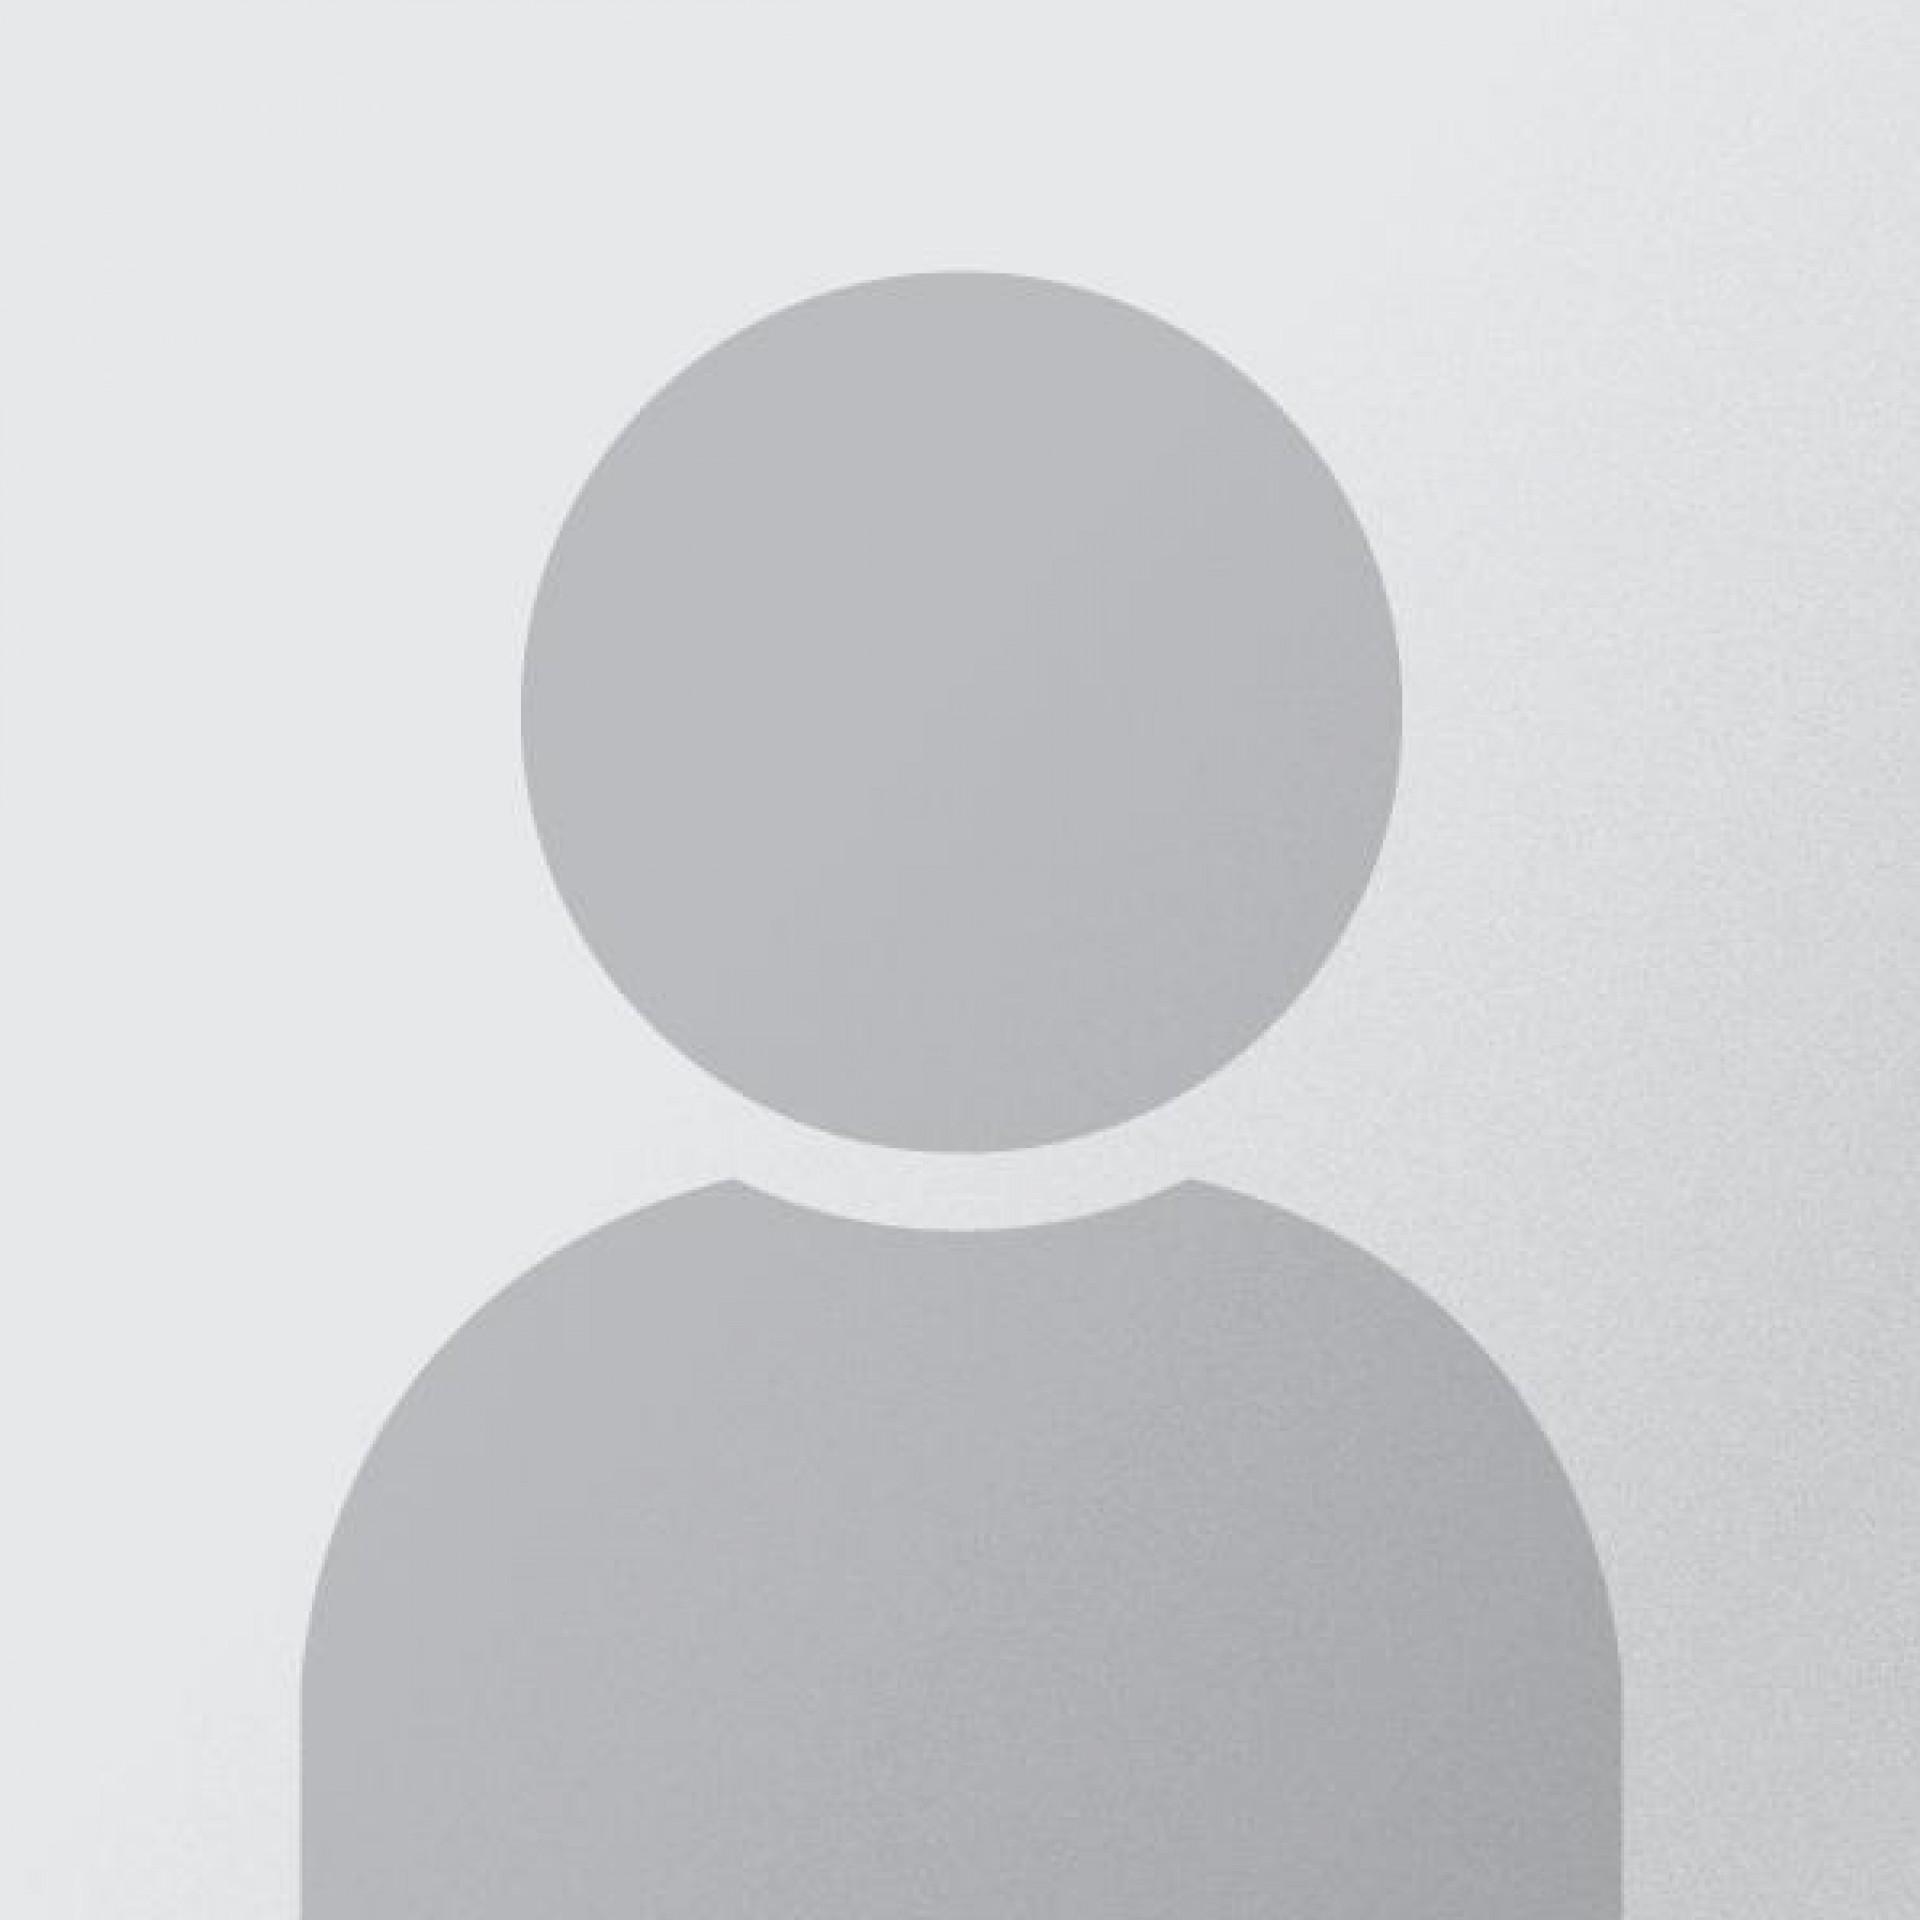 fotografia p021 profilu 01022V3U40